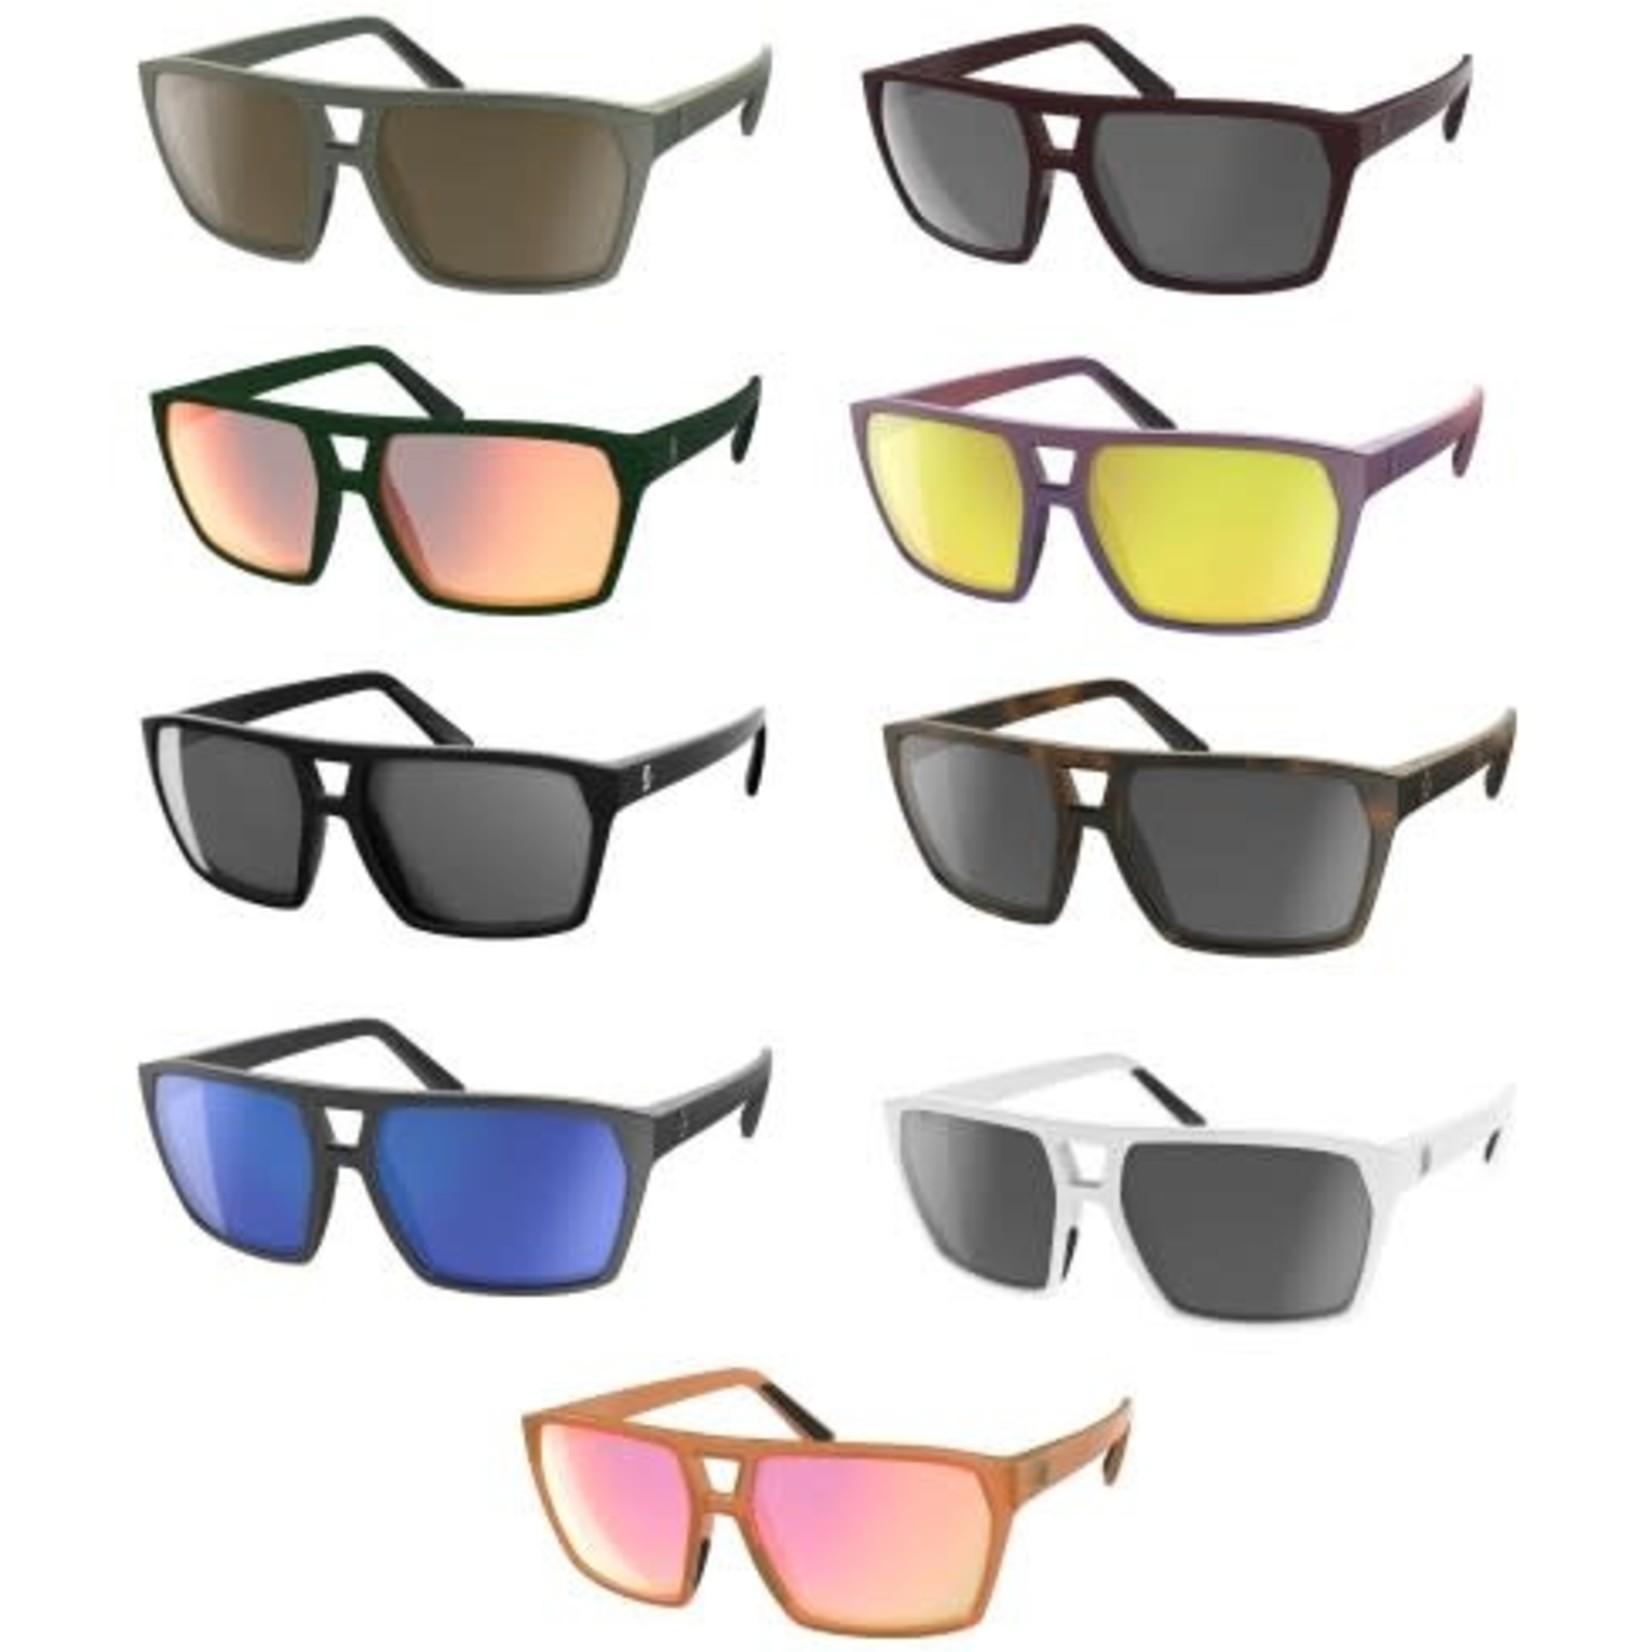 Scott SCO Sunglasses Tune